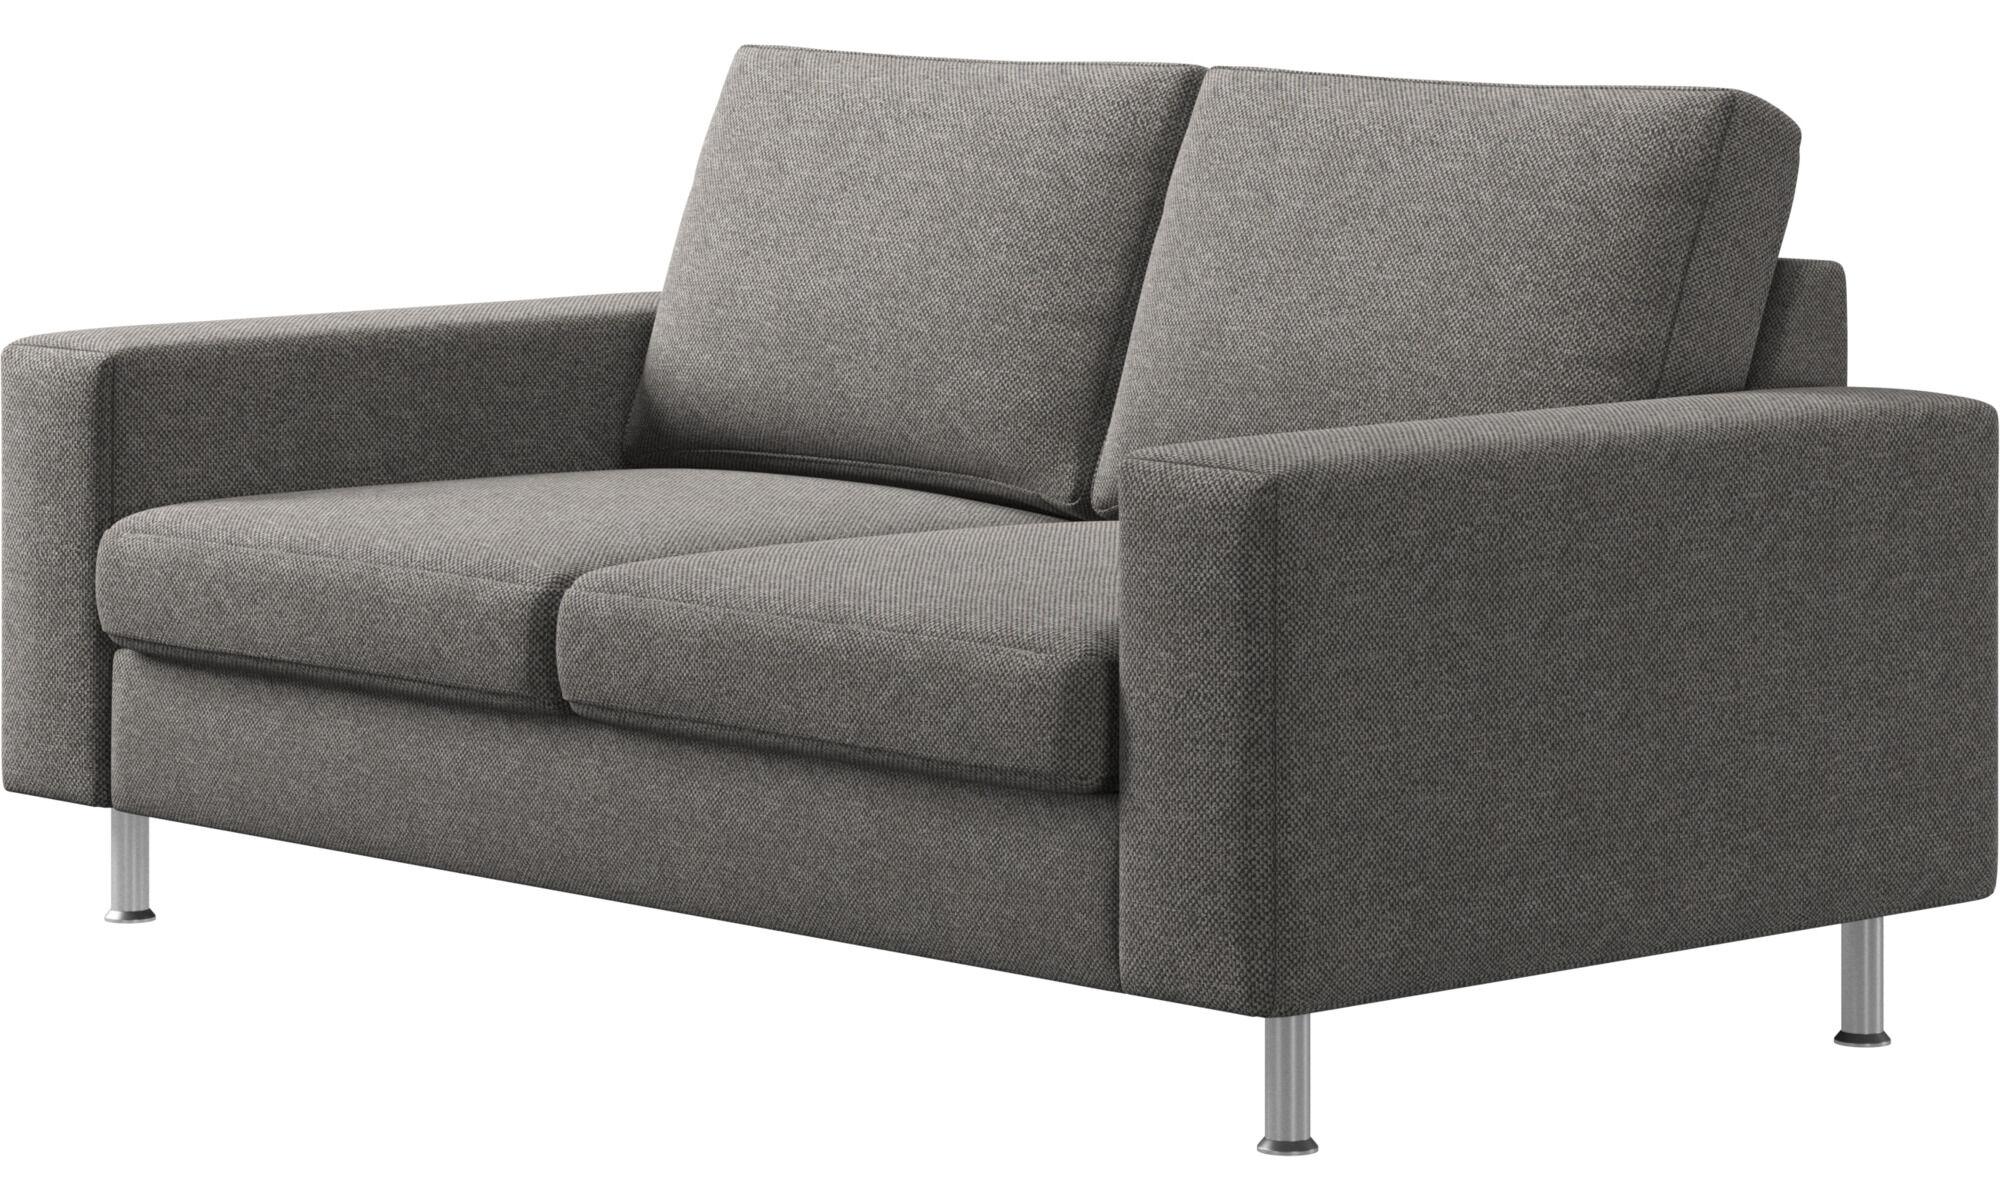 ... 2 Sitzer Sofas   Indivi Sofa   Grau   Stoff ...